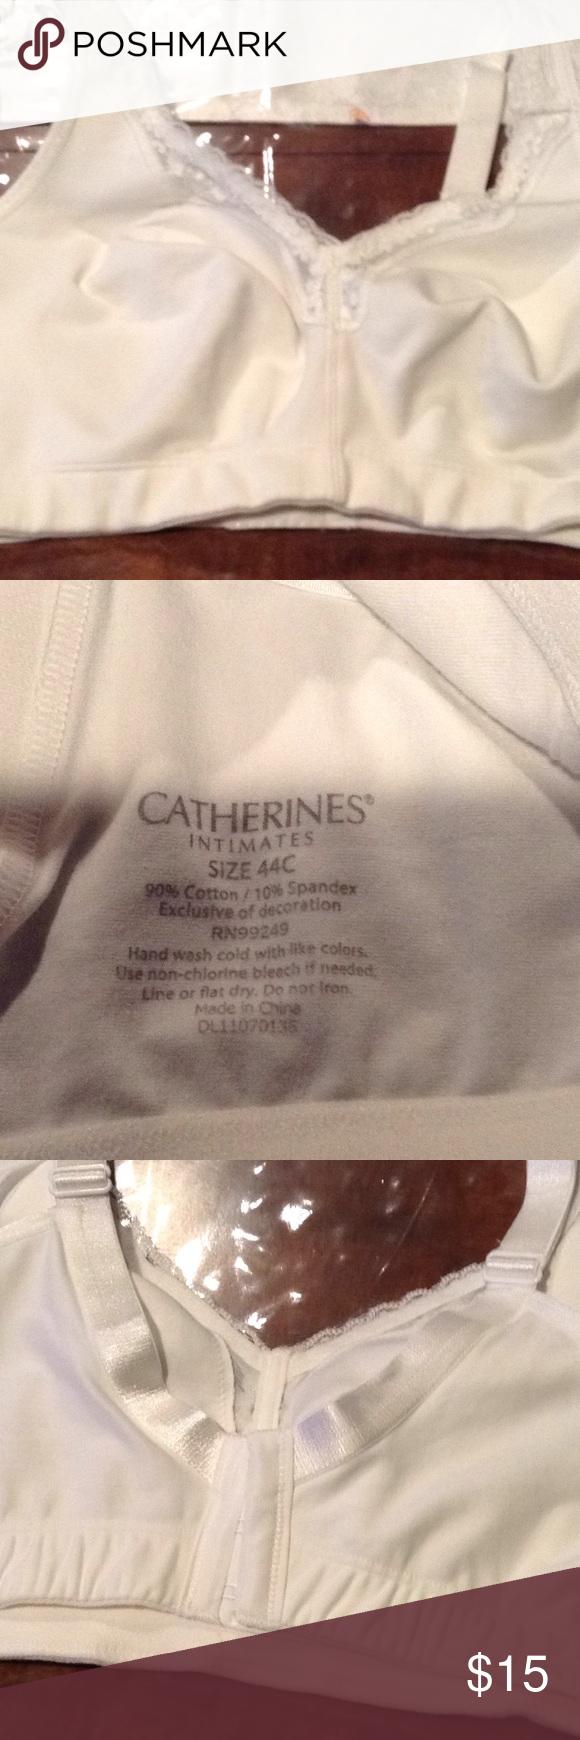 ac5a770a66 Catherine s bra size 44C NEW White Catherine s intimates